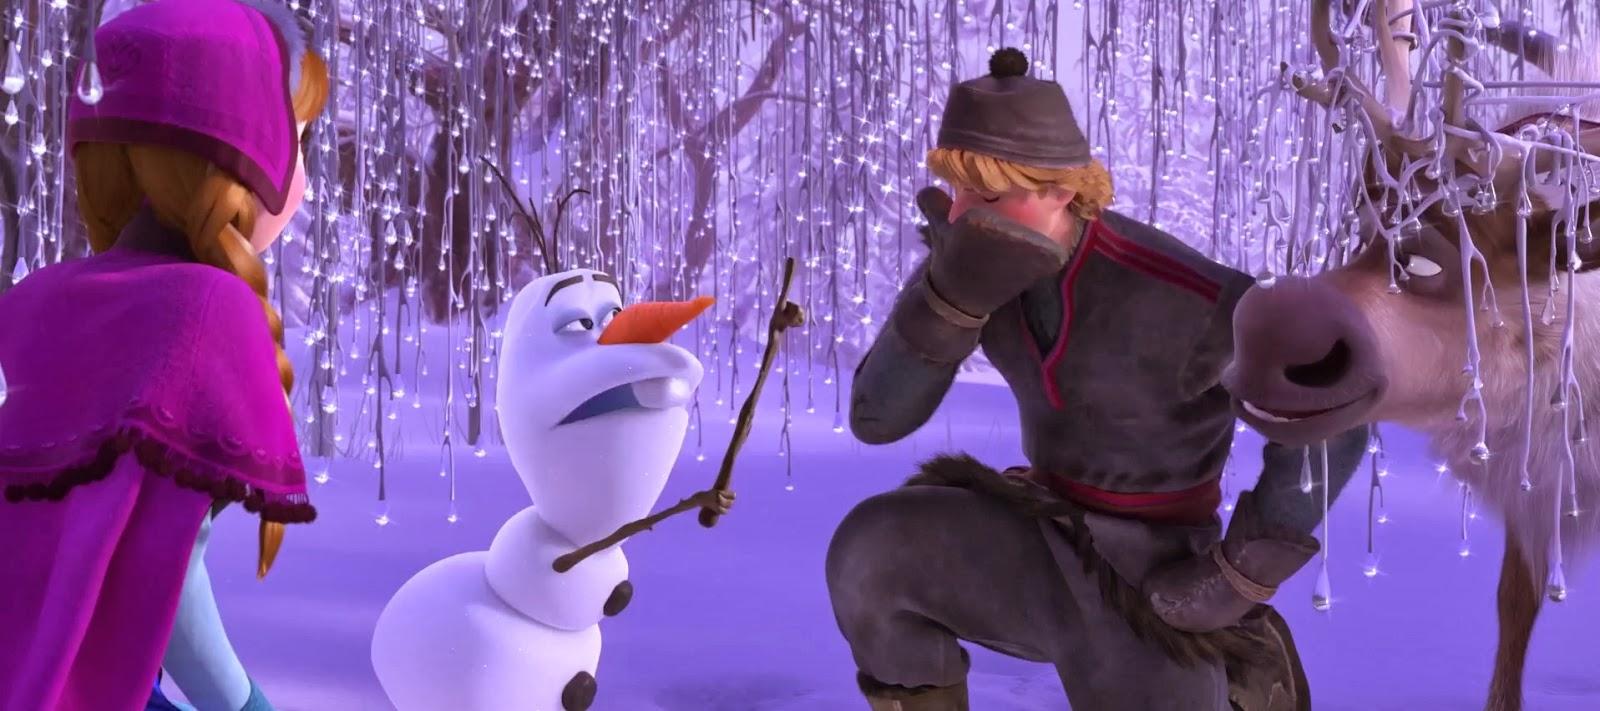 Disneys Frozen Party Is Over Clip Youtube 5318971 Libertar Info -> Pelismegahd